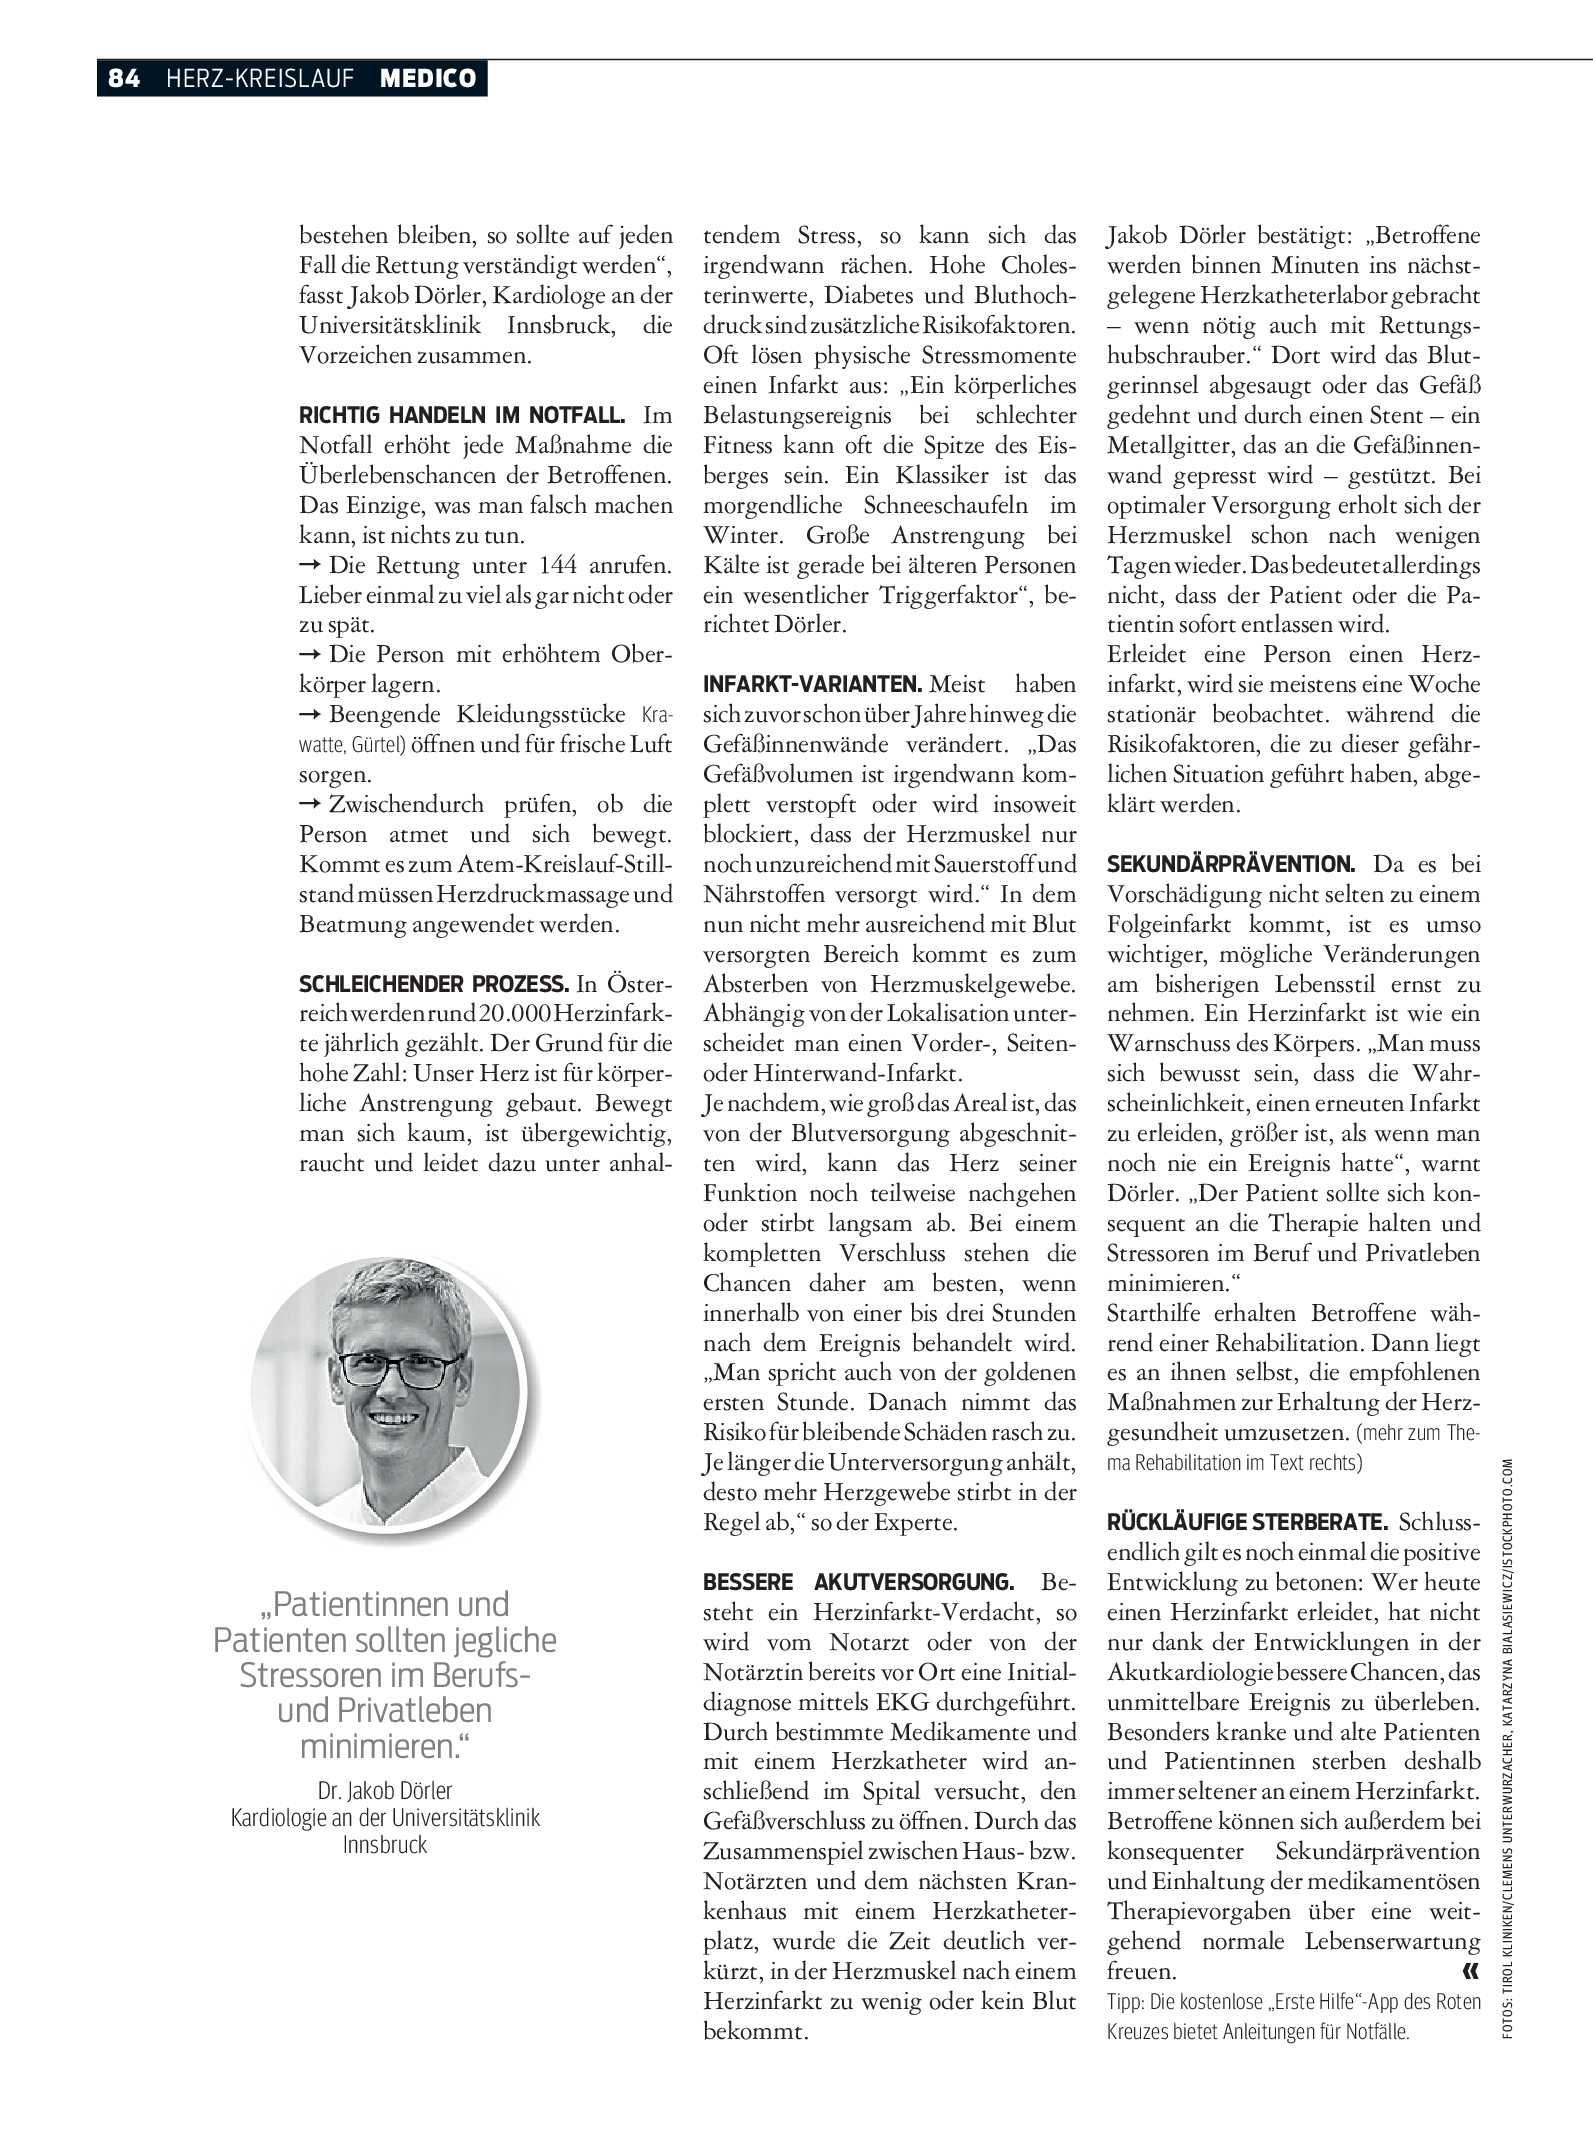 public/epaper/imported/20201125/kurier/magazin/magazin_20201125_084.jpg